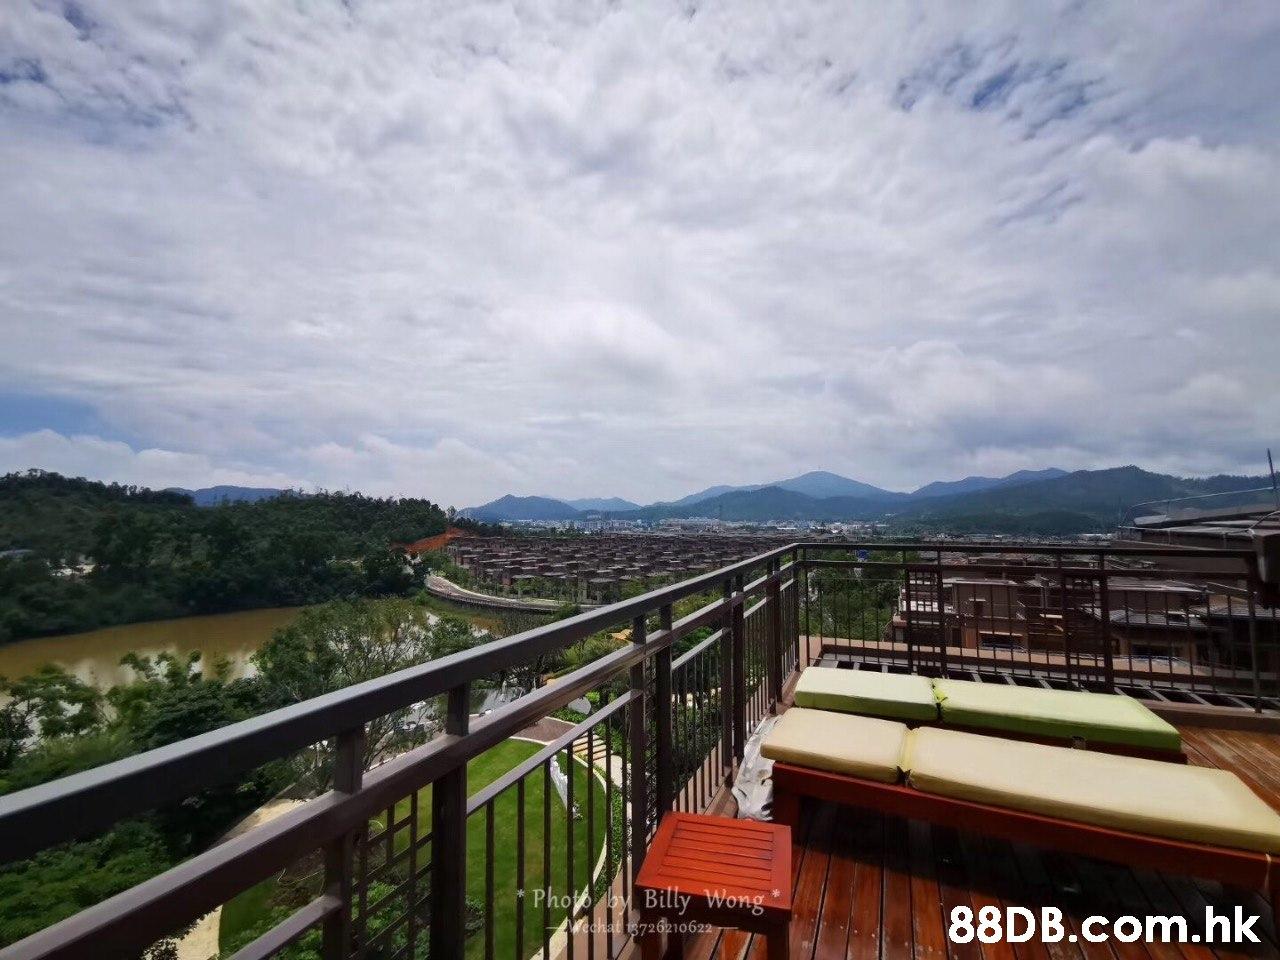 Phon Billy Wong .hk Wechat 3726210622  Sky,Property,Cloud,Mountain,Tree